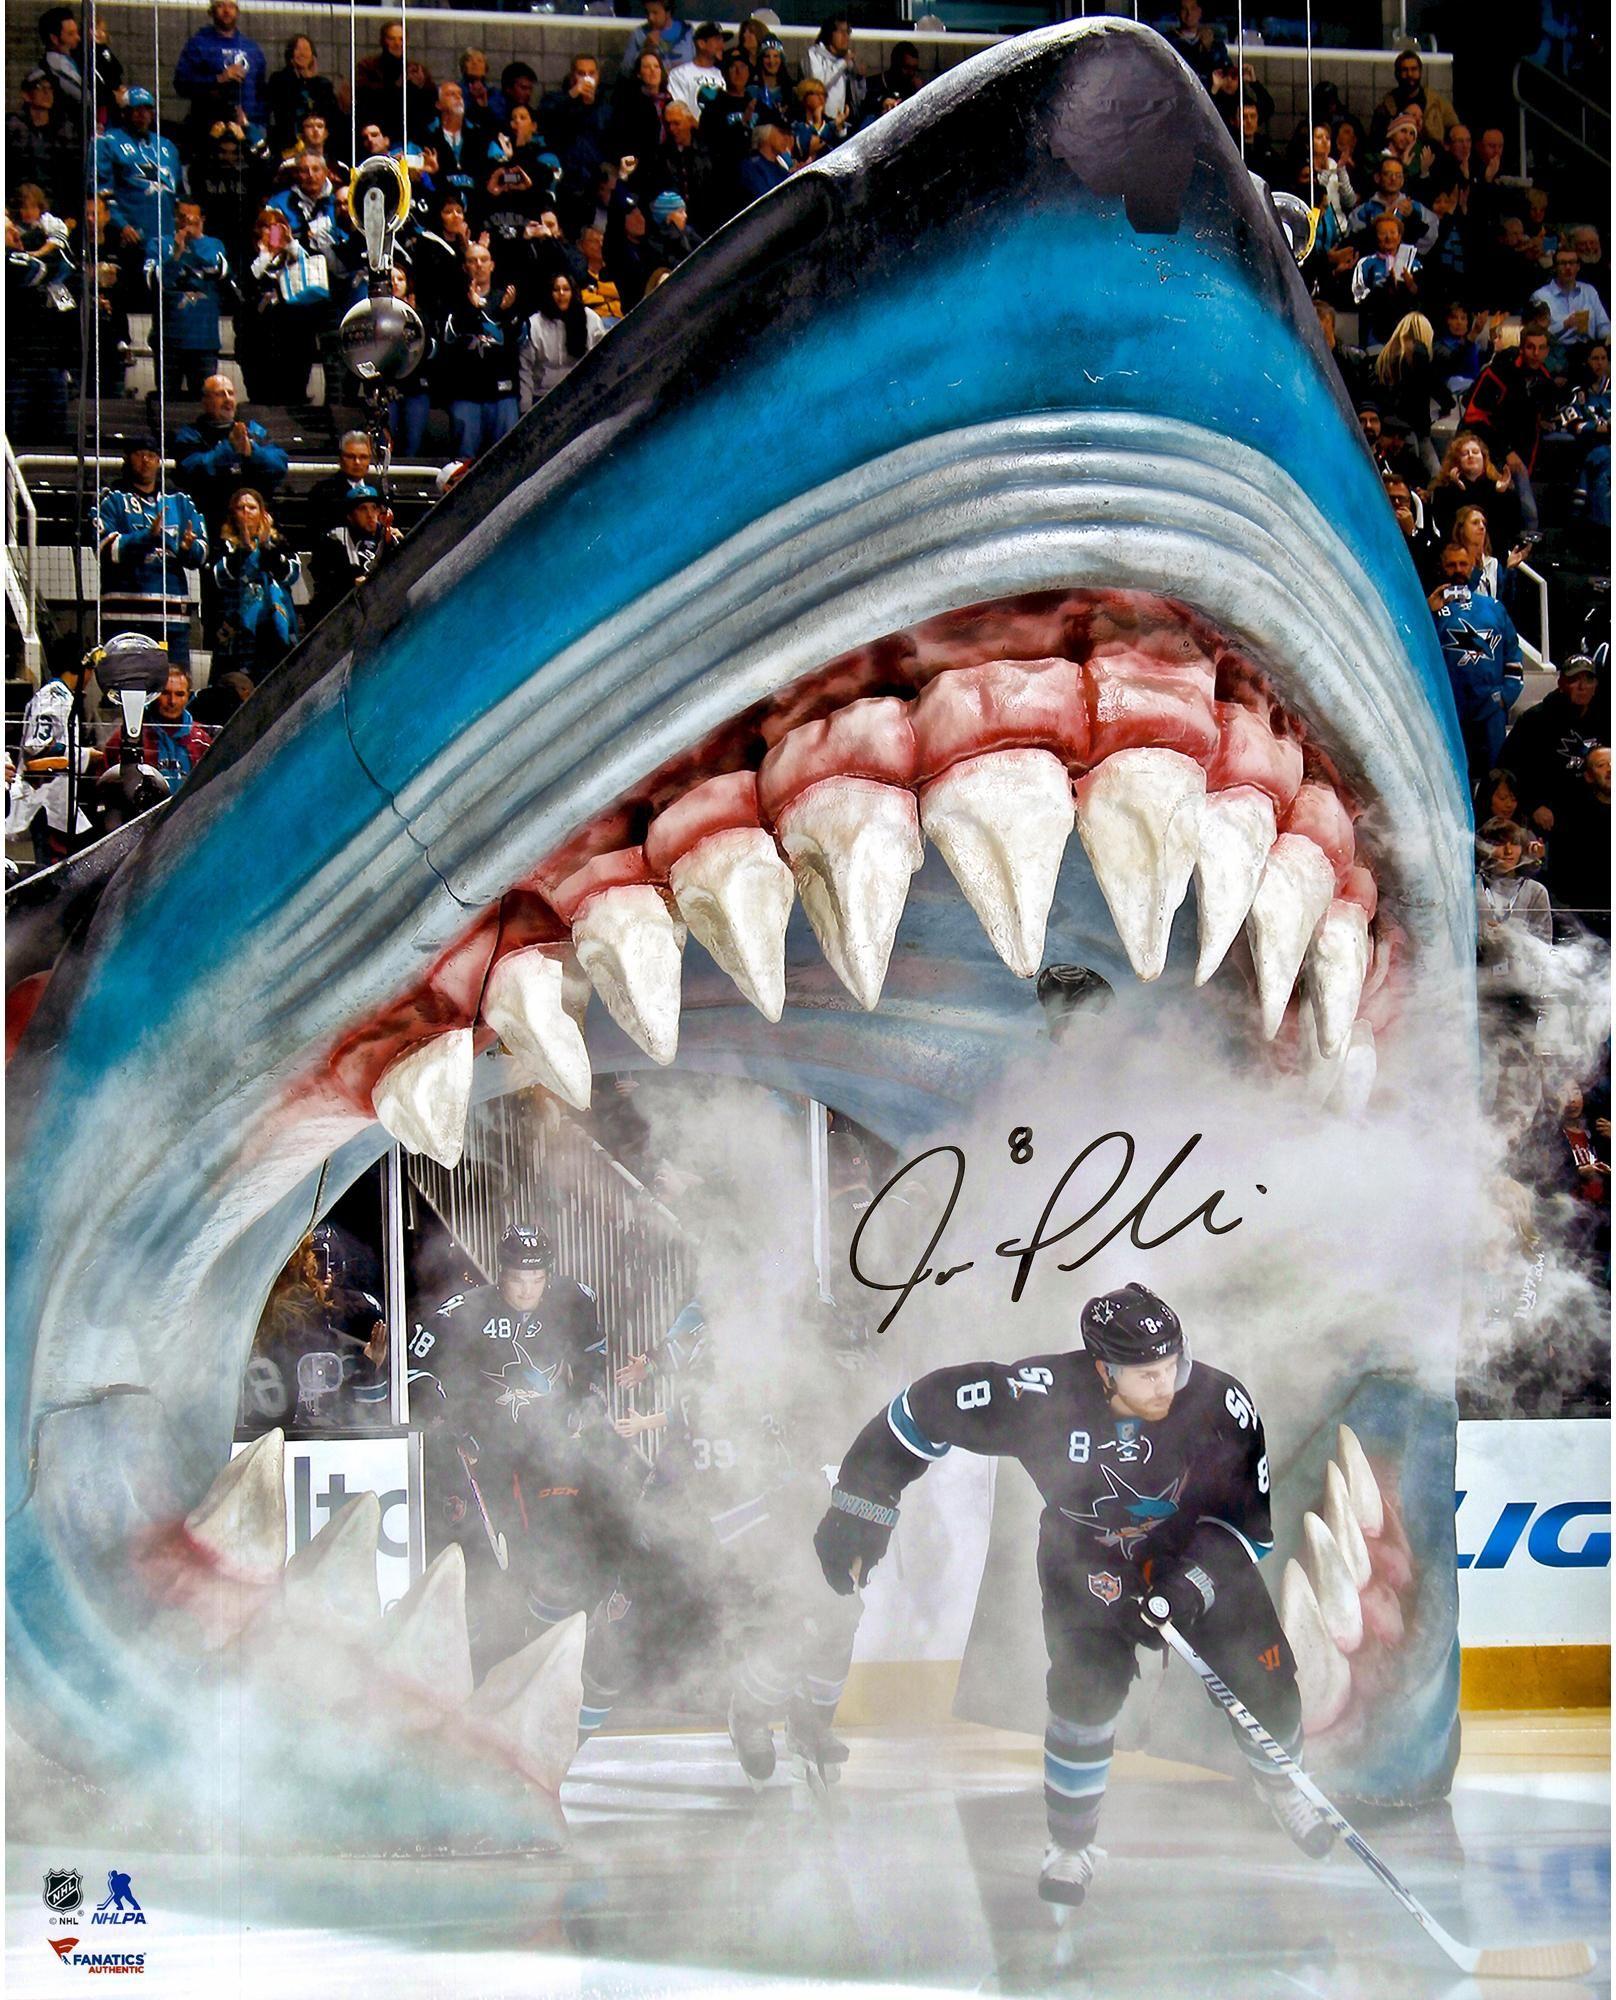 outlet store 6f8b0 25f2c Joe Pavelski San Jose Sharks Autographed Out Of Shark's ...